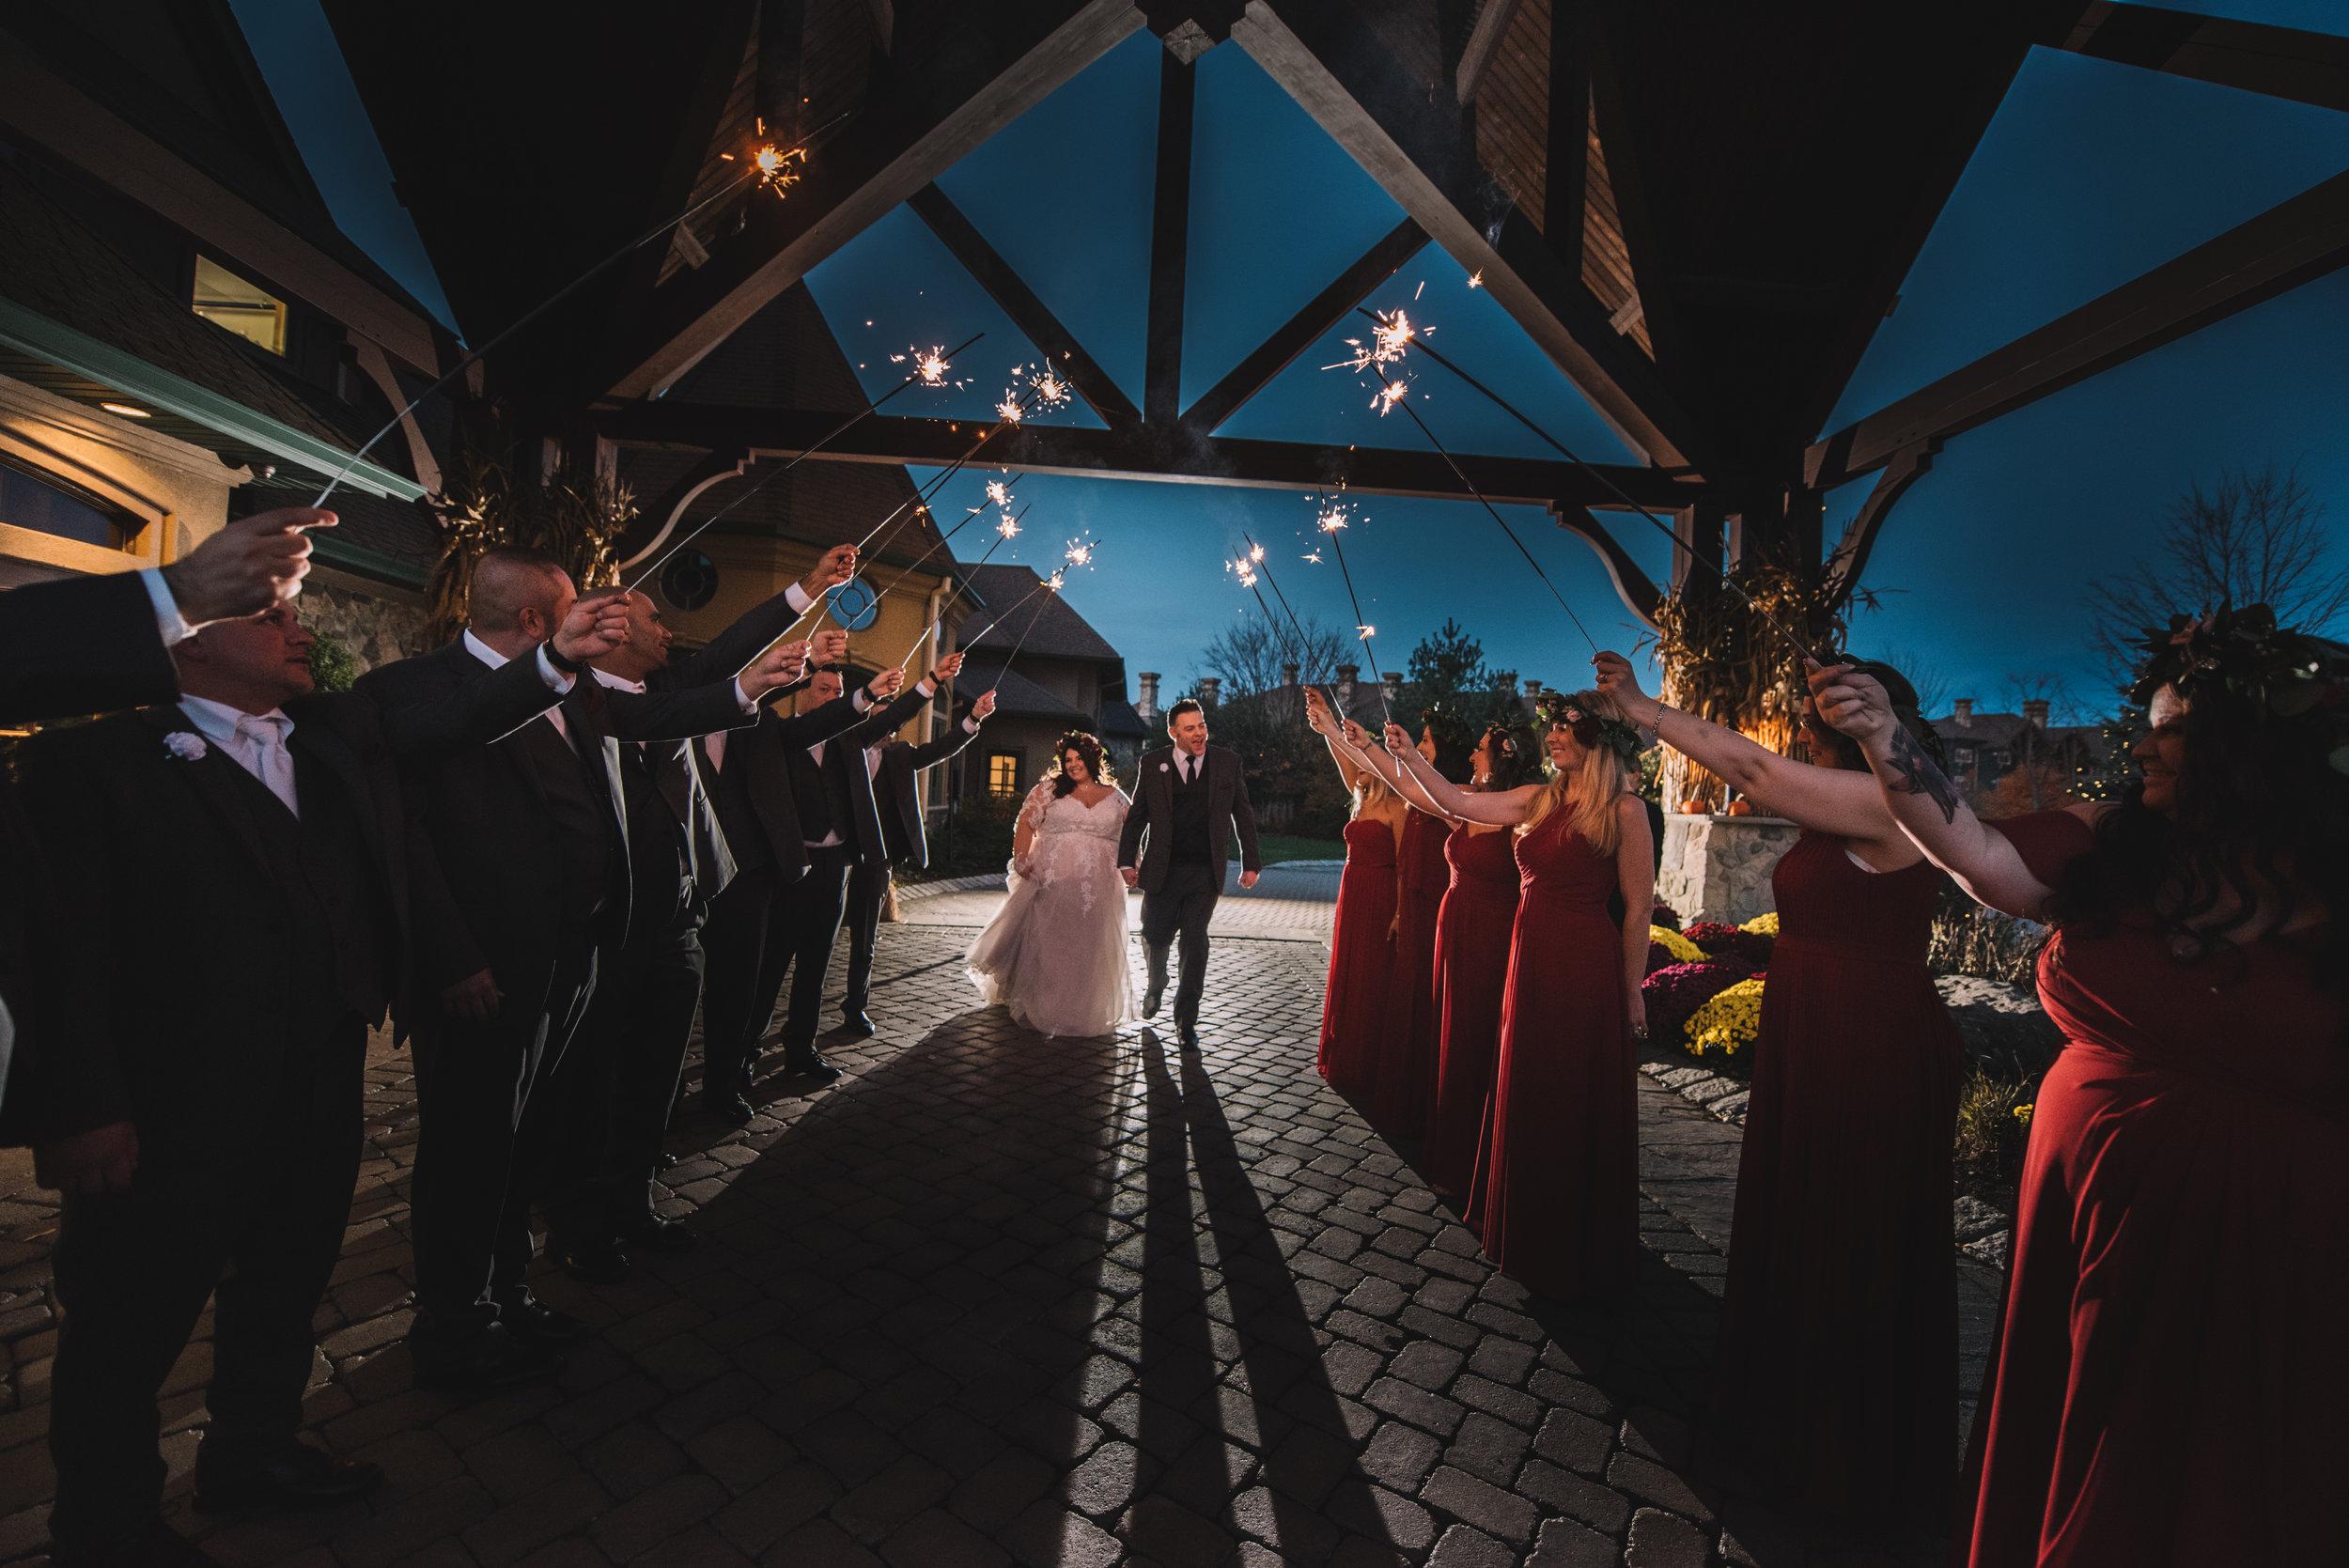 WeddingPhotos | NJPhotographer | Highlights-14-12.jpg